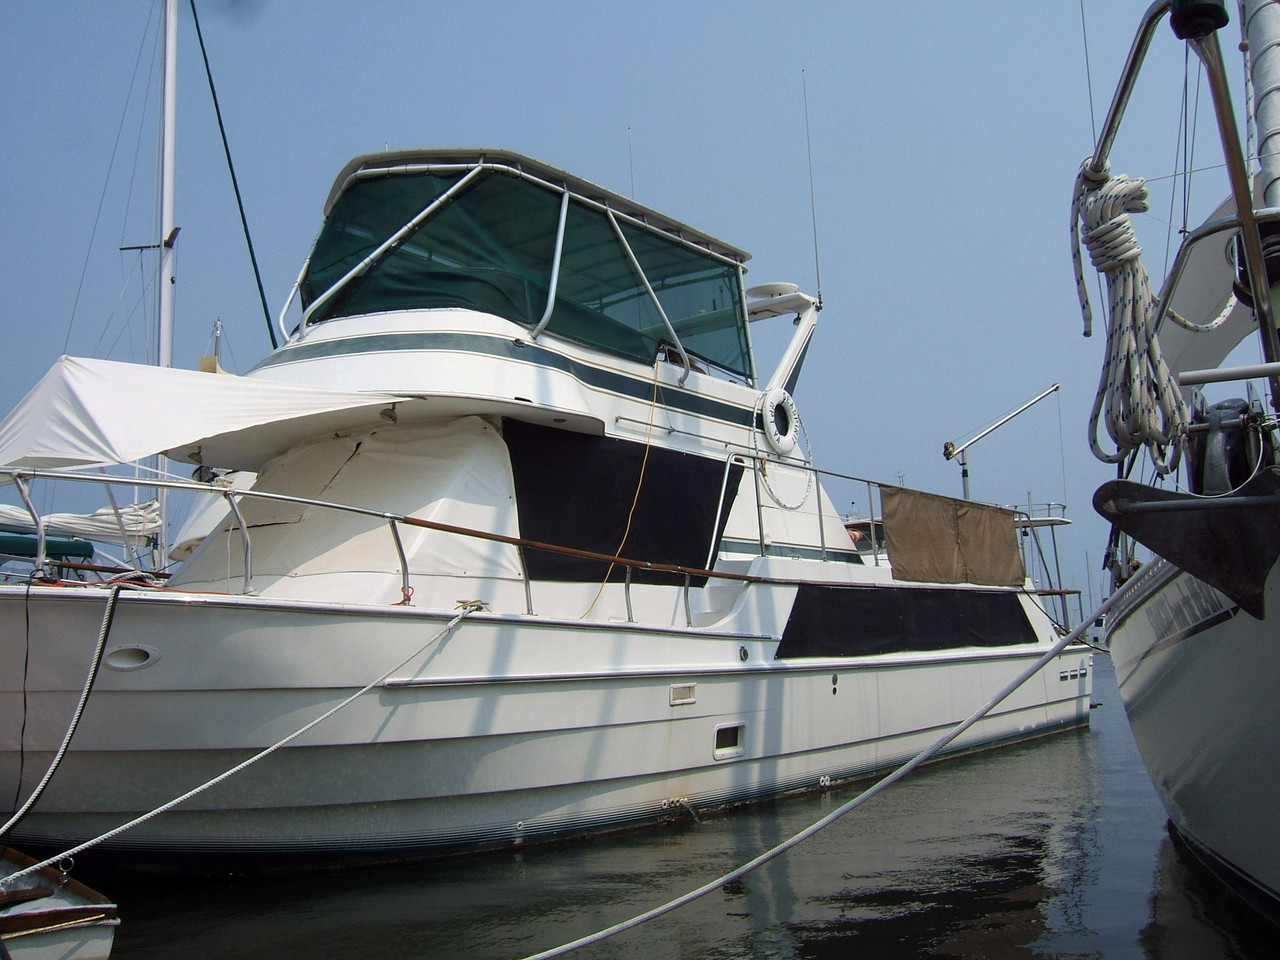 1981 Used Coastal Cruiser 52 Motor Yacht For Sale